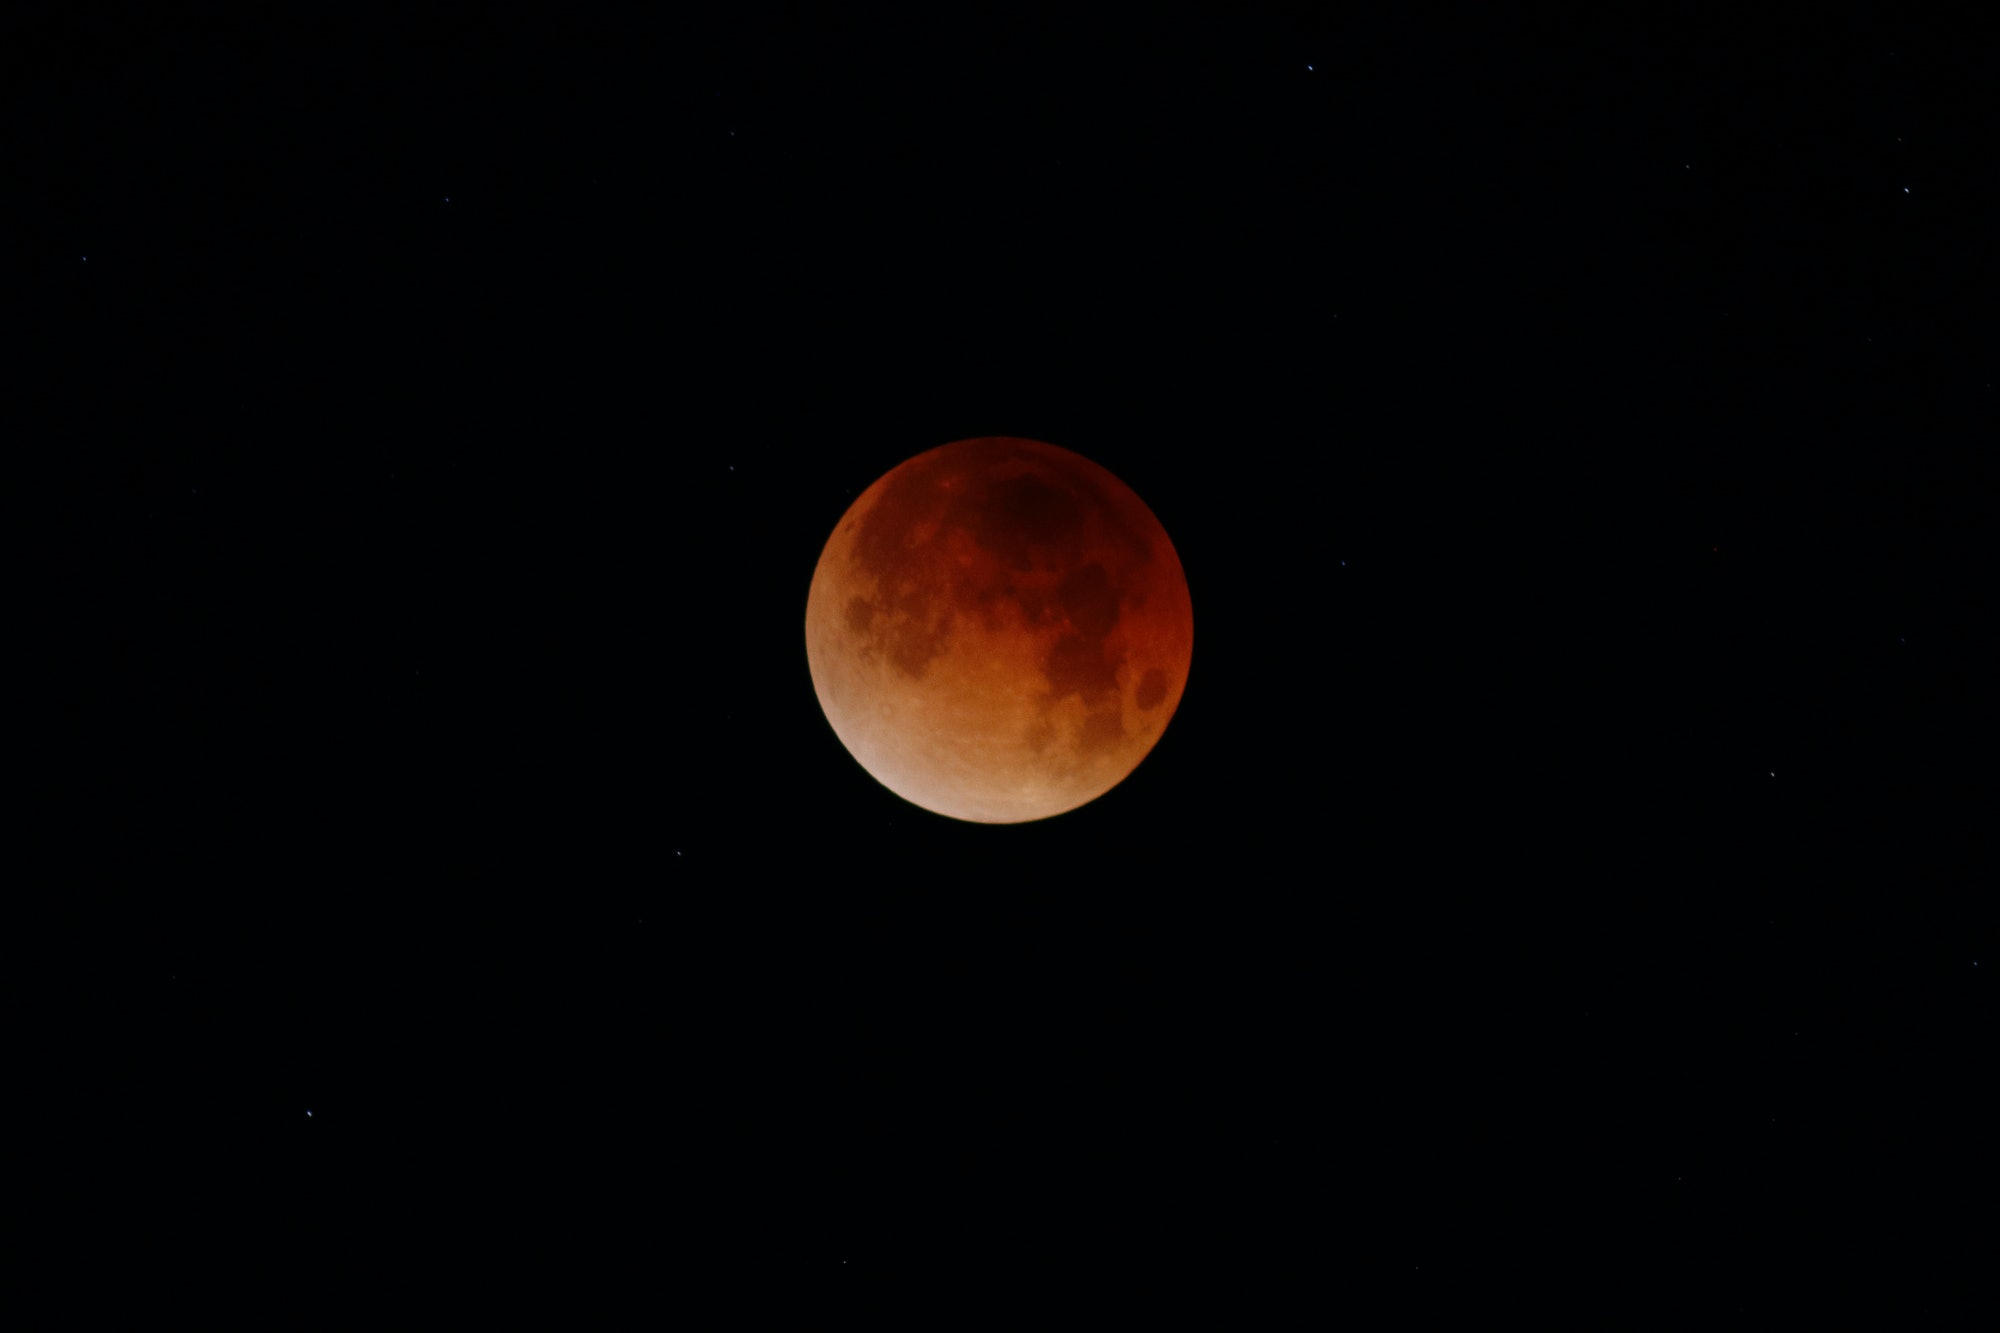 Supermoon/Blue Moon/Eclipse/Blood Moon 1/31/2018